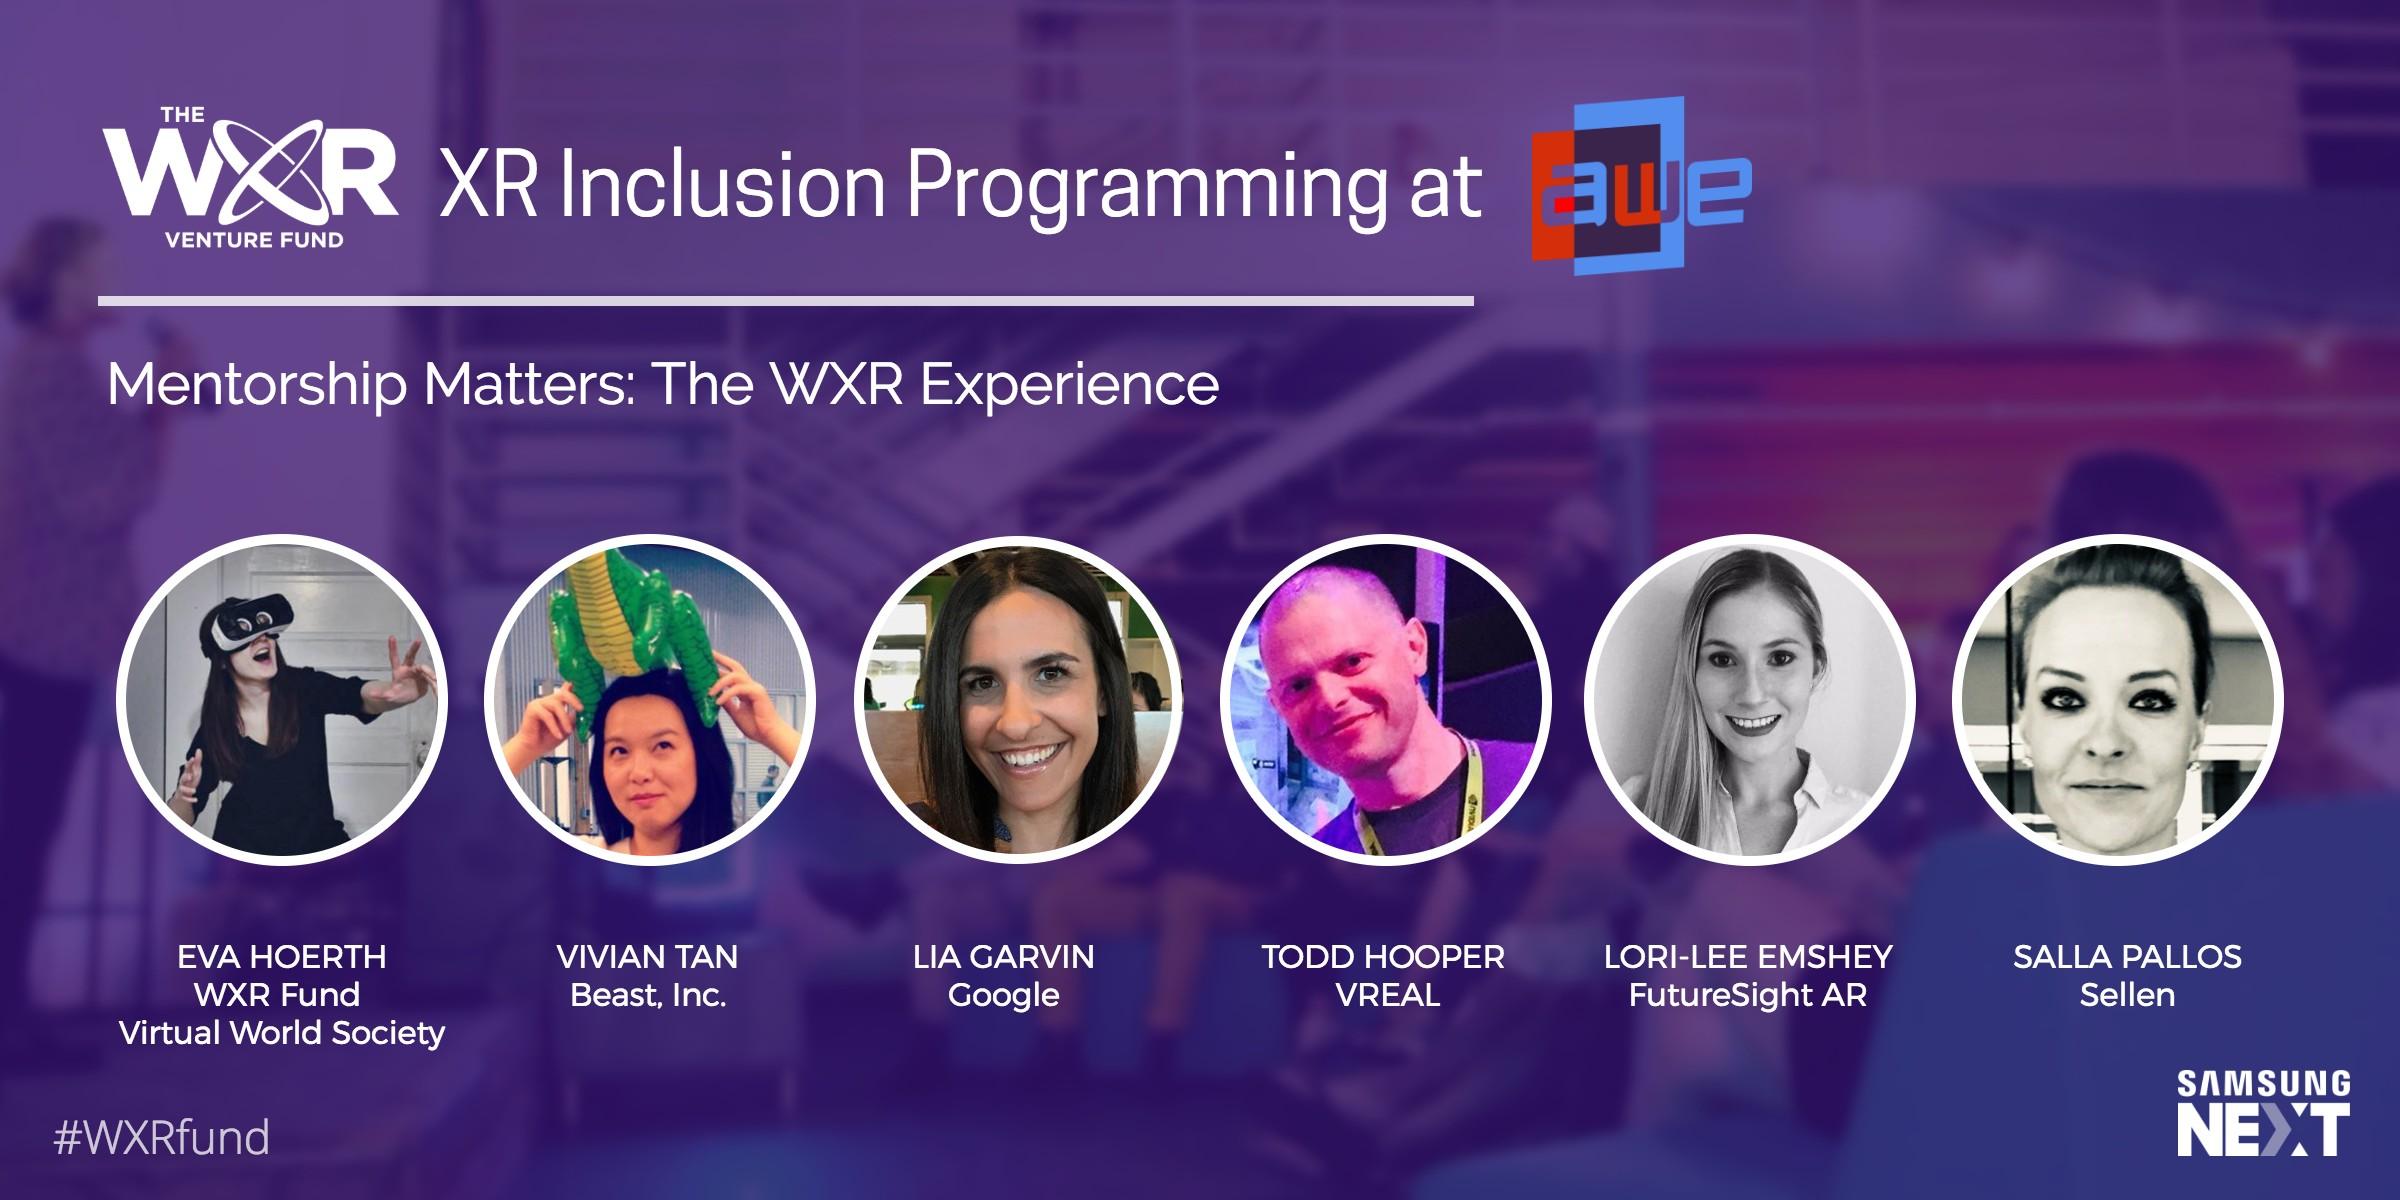 WXR-Fund-AWE-2018-Lia Garvin-Google-Eva Hoerth-Vivian Tan-Todd Hooper.jpg